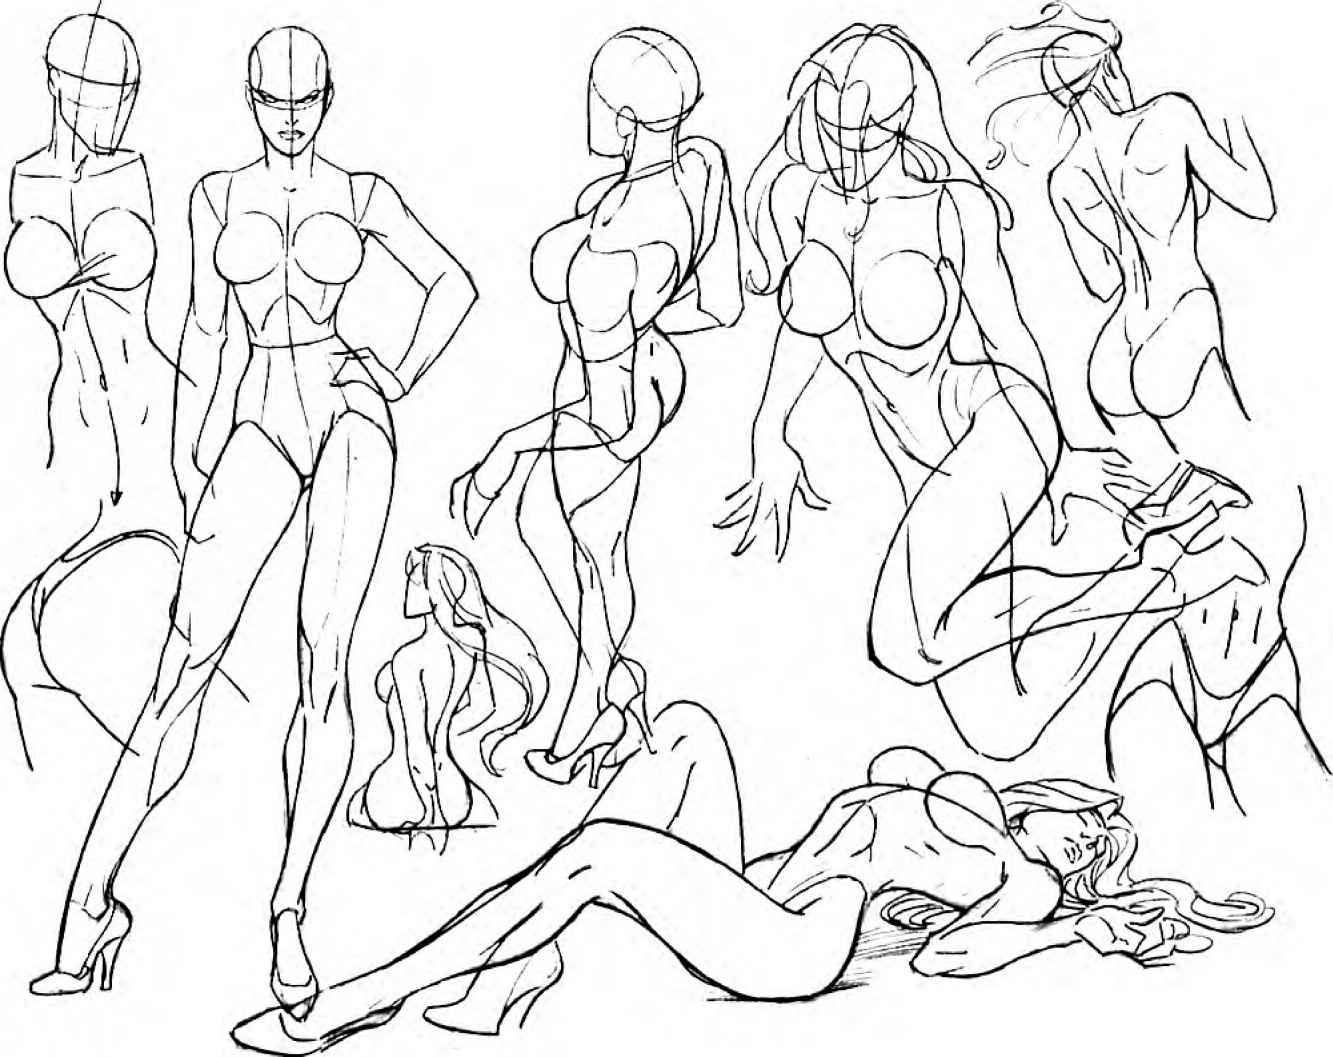 Uae girl full nude